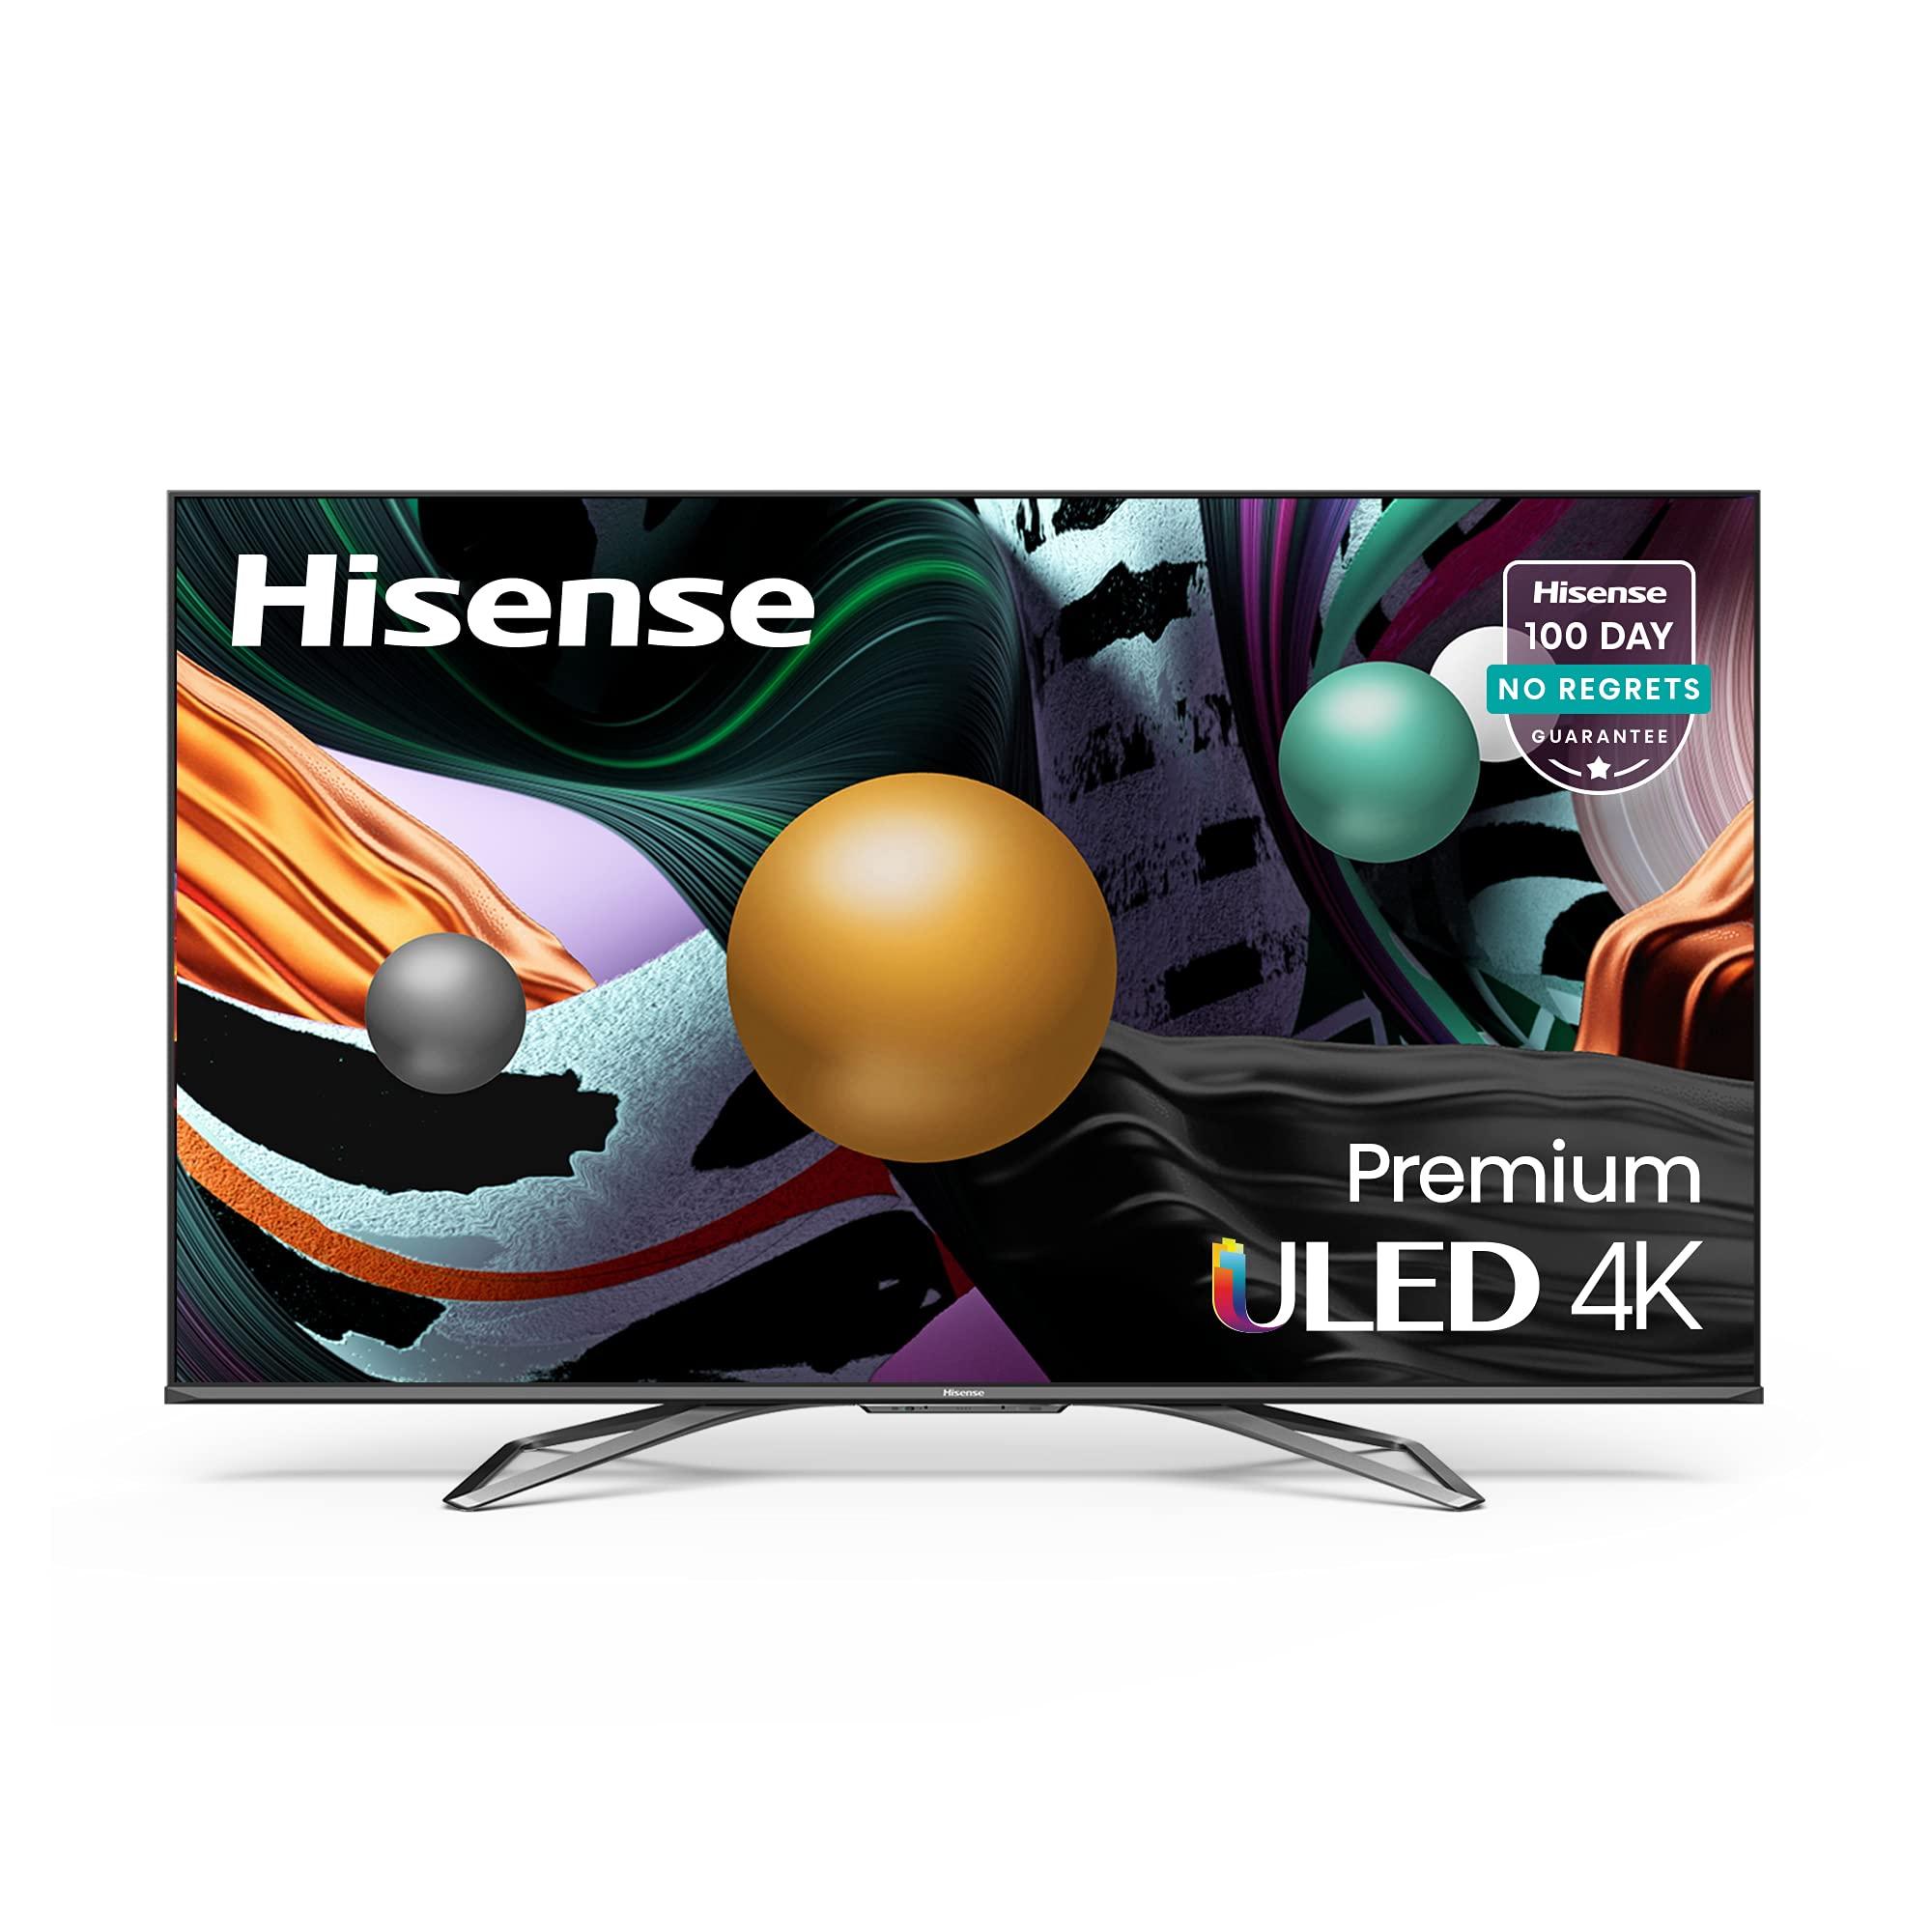 Hisense ULED Premium 55-Inch Class U8G Quantum Series Android 4K Smart TV with Alexa Compatibility (55U8G, 2021 Model)